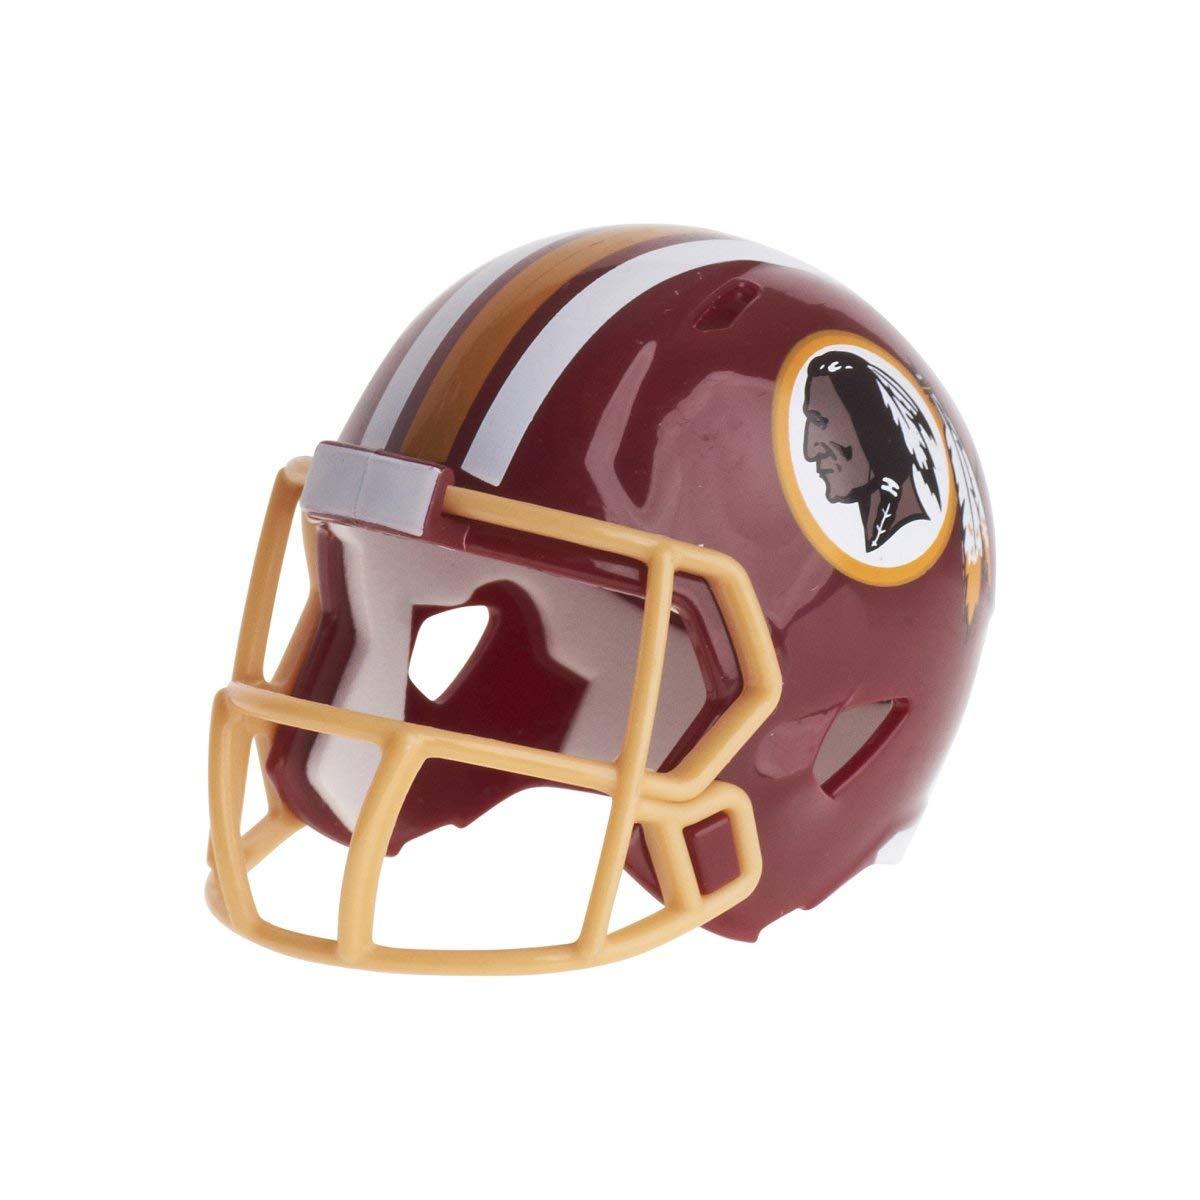 Riddell Washington Redskins Mini-Speed Pocket Pro Micro/Kamerahandys/Football Helm 095855320786